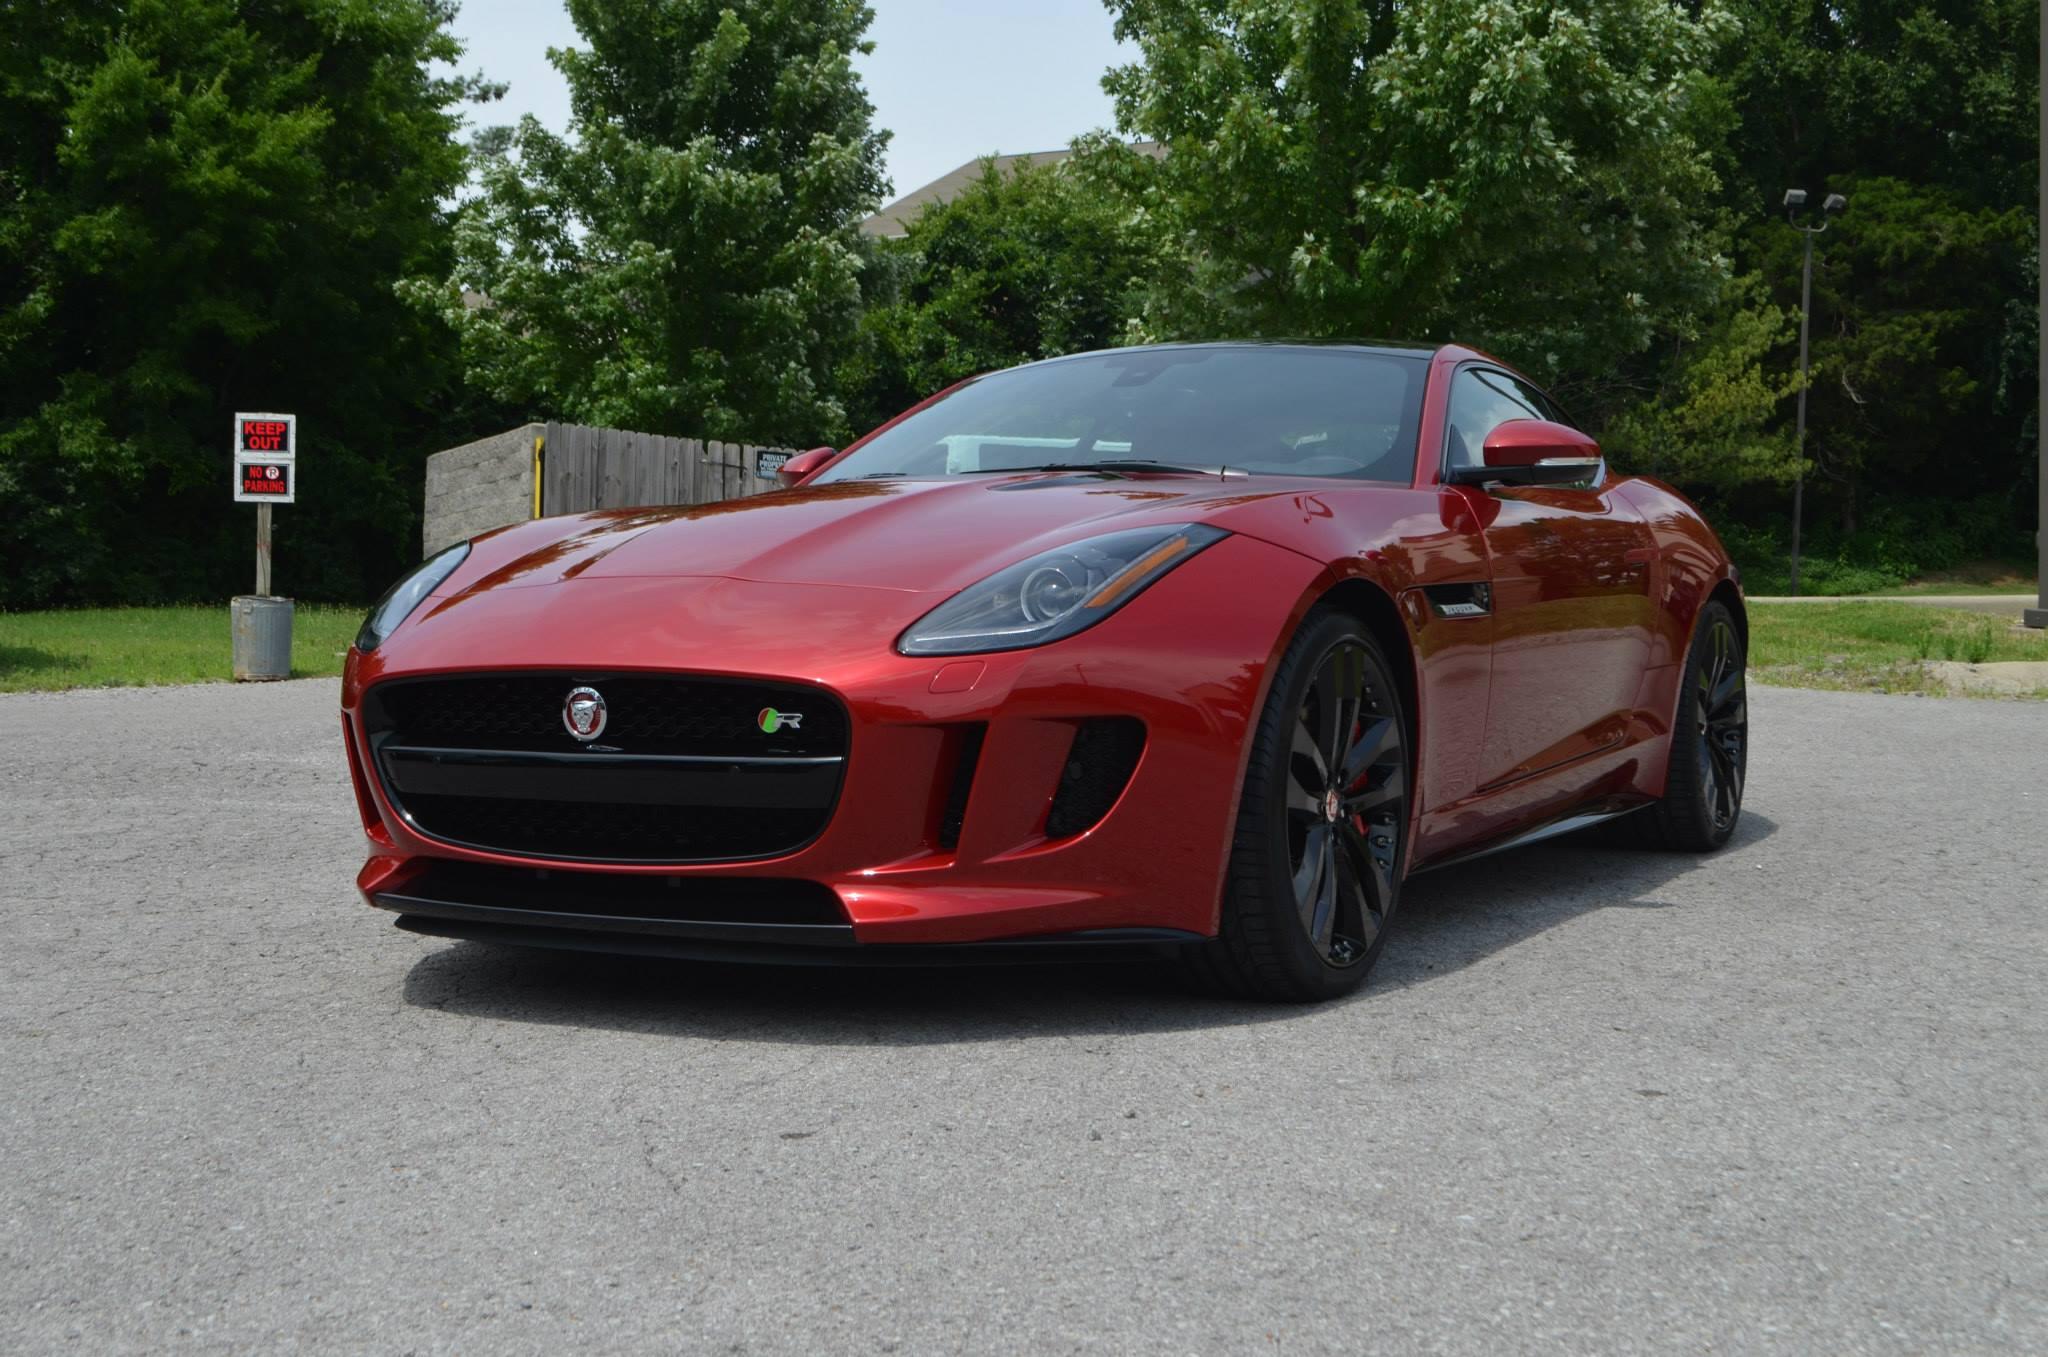 Jaguar F-Type R: Track Pack PPF, CQ FINEST Reserve